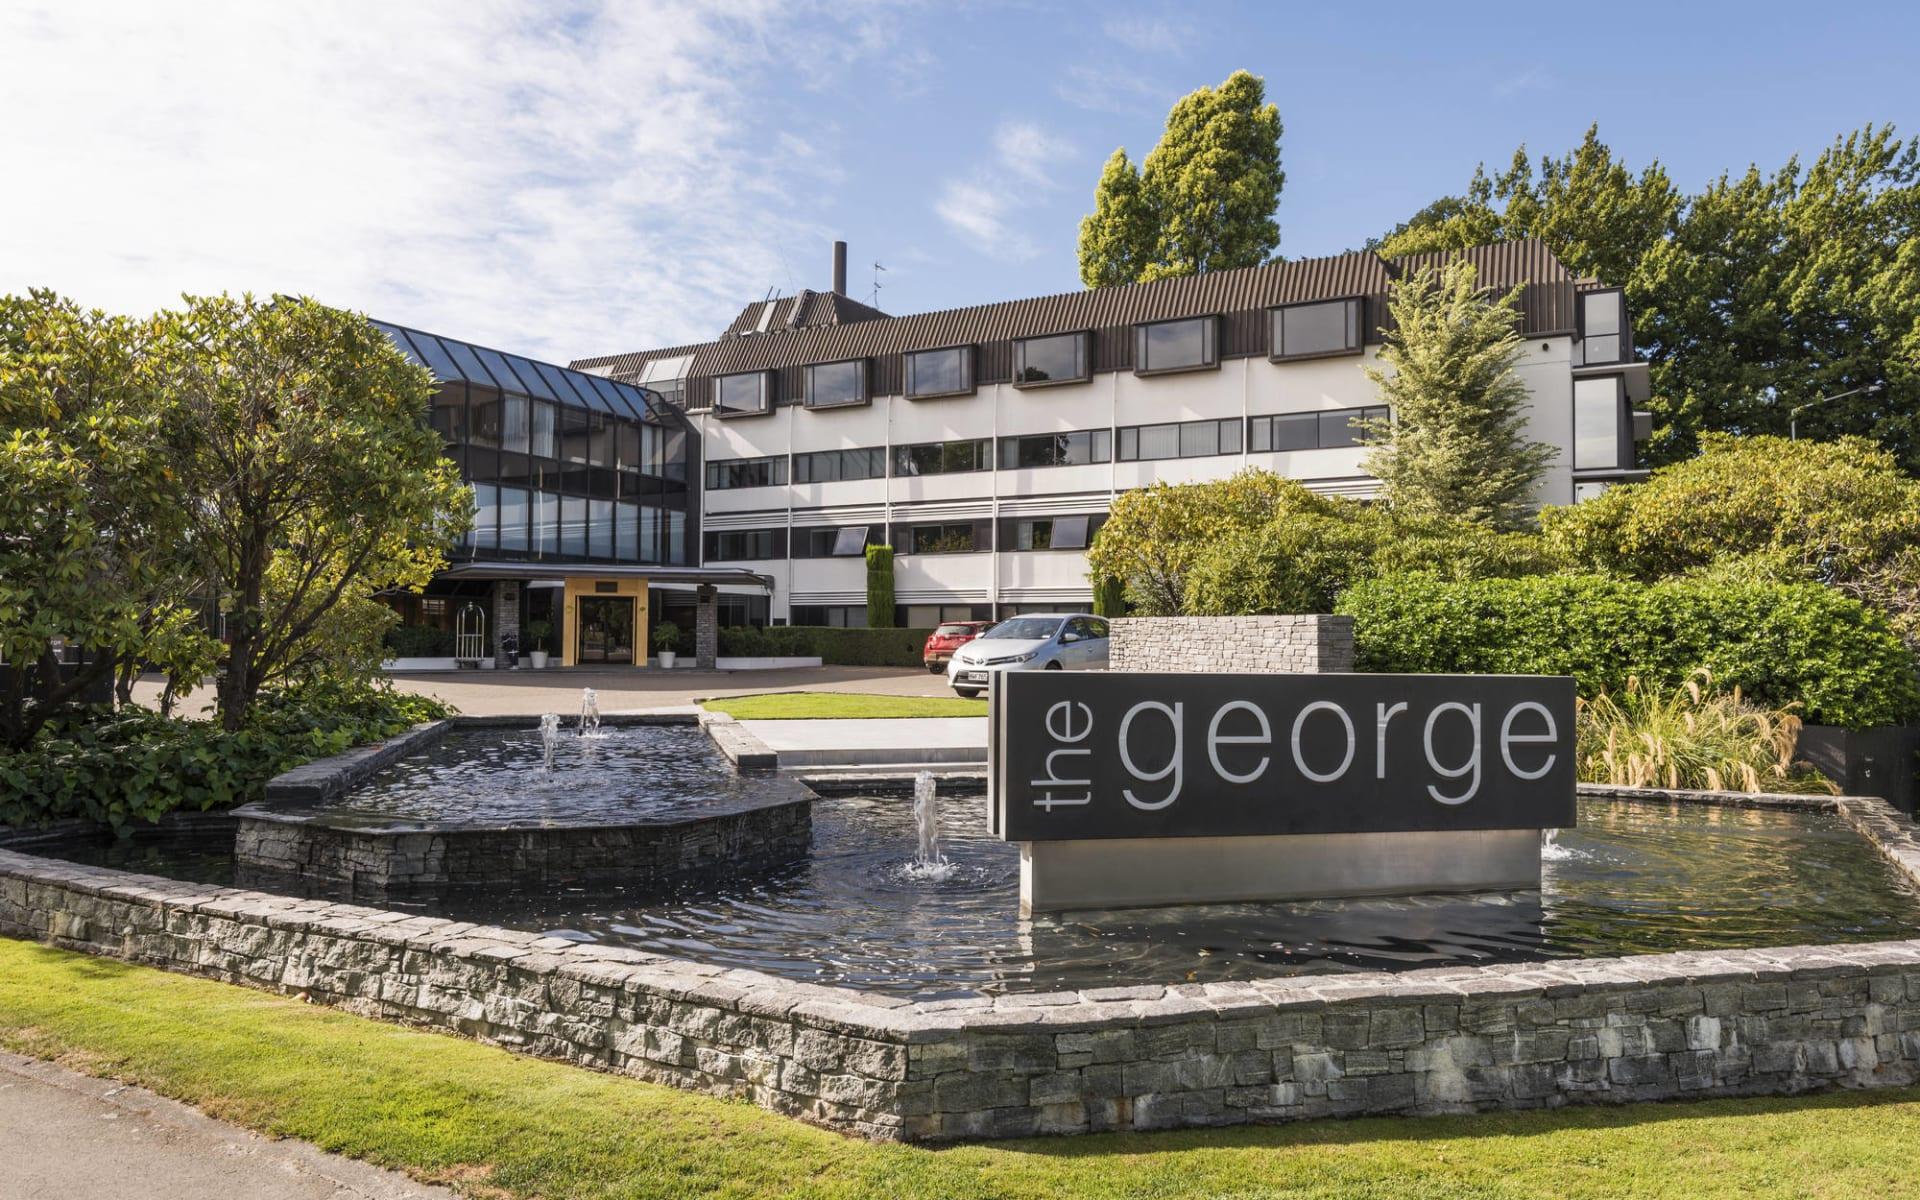 The George Hotel in Christchurch:  the George Hotel Christchurch